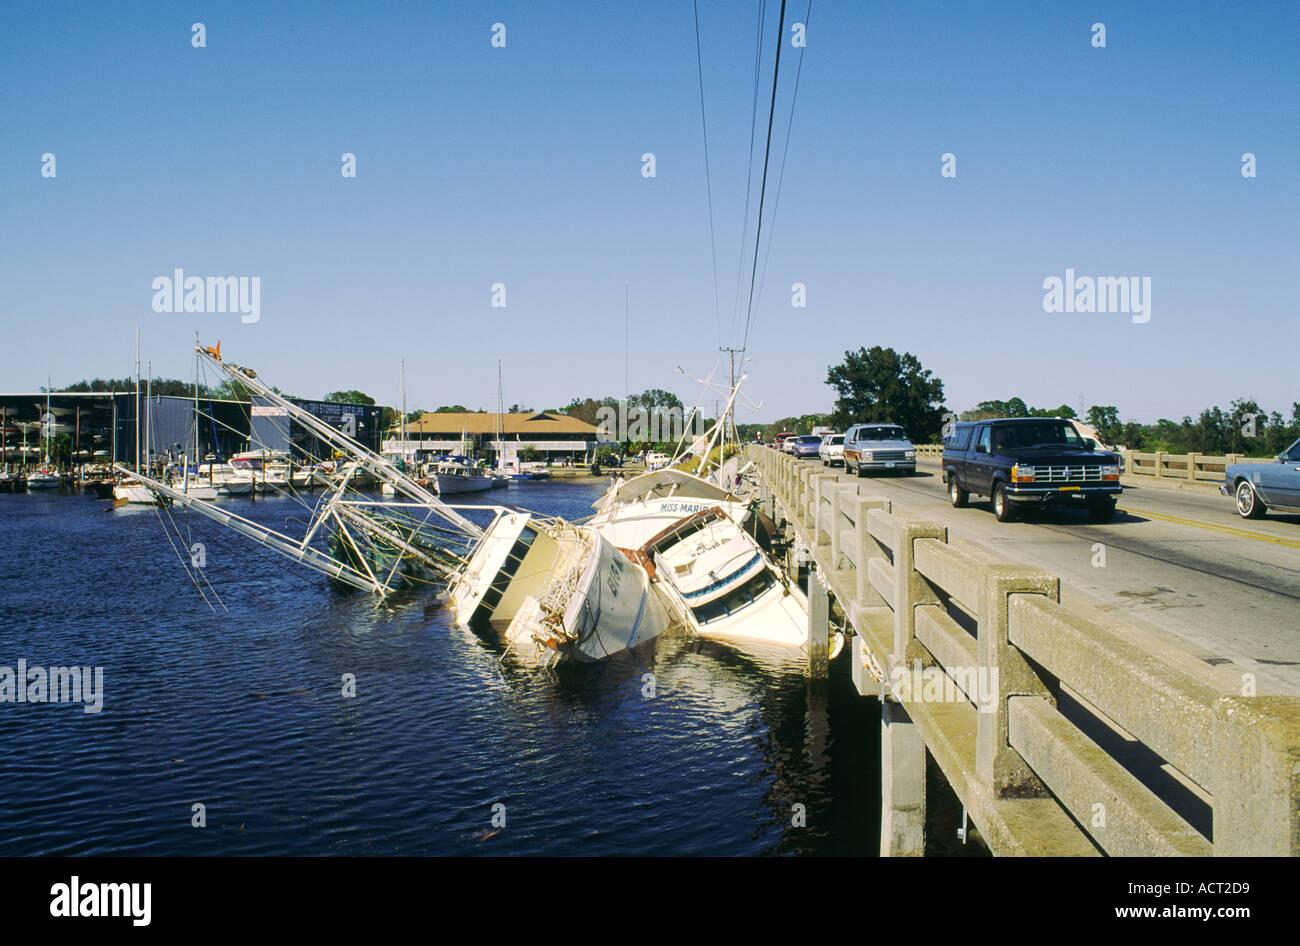 Gulf Coast storm tornado hurricane damaged shrimp fishing and pleasure boats at the Sponge Docks, Tarpon Springs, Florida, USA - Stock Image